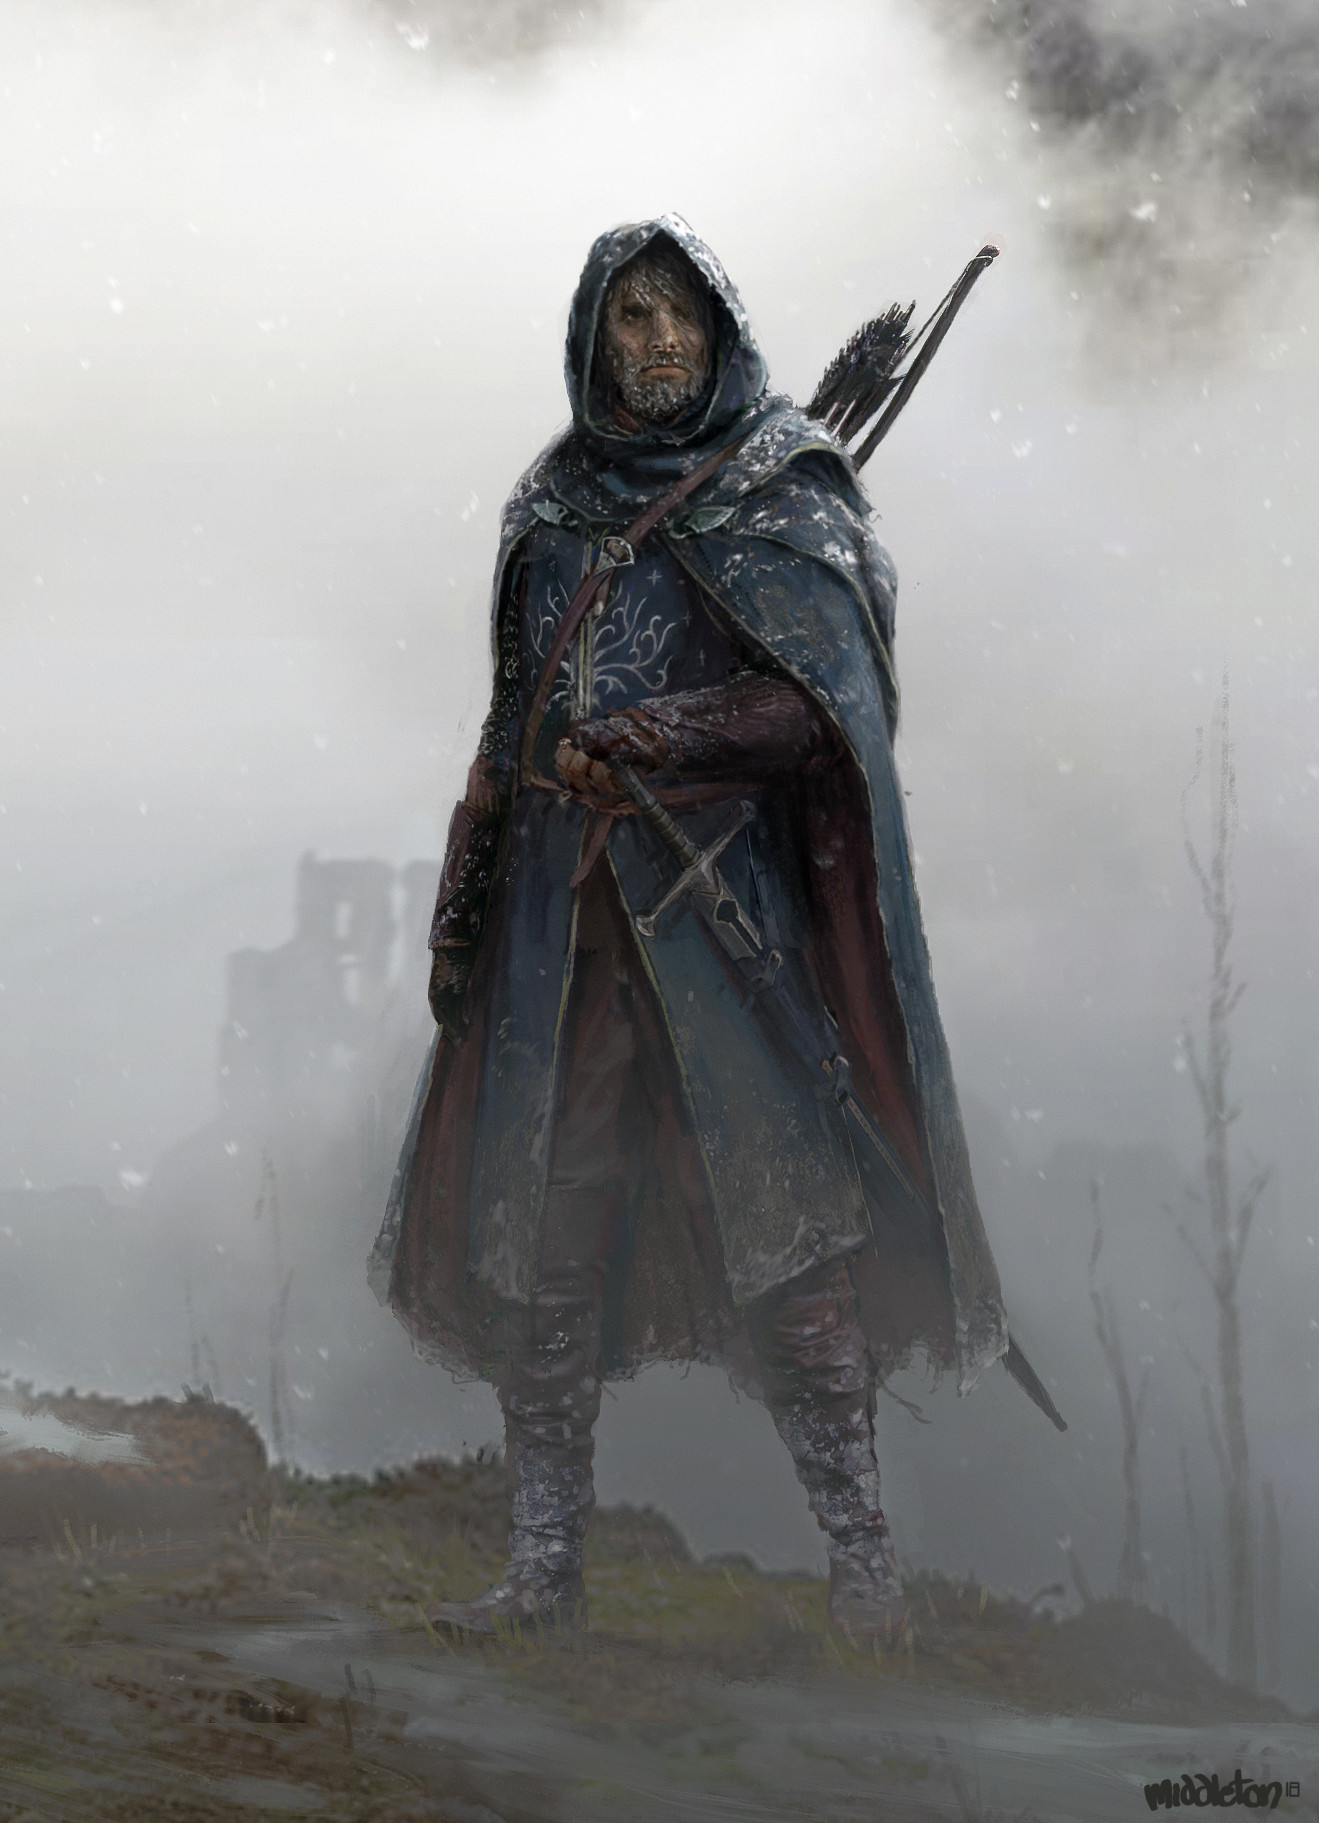 Aragorn the Ranger